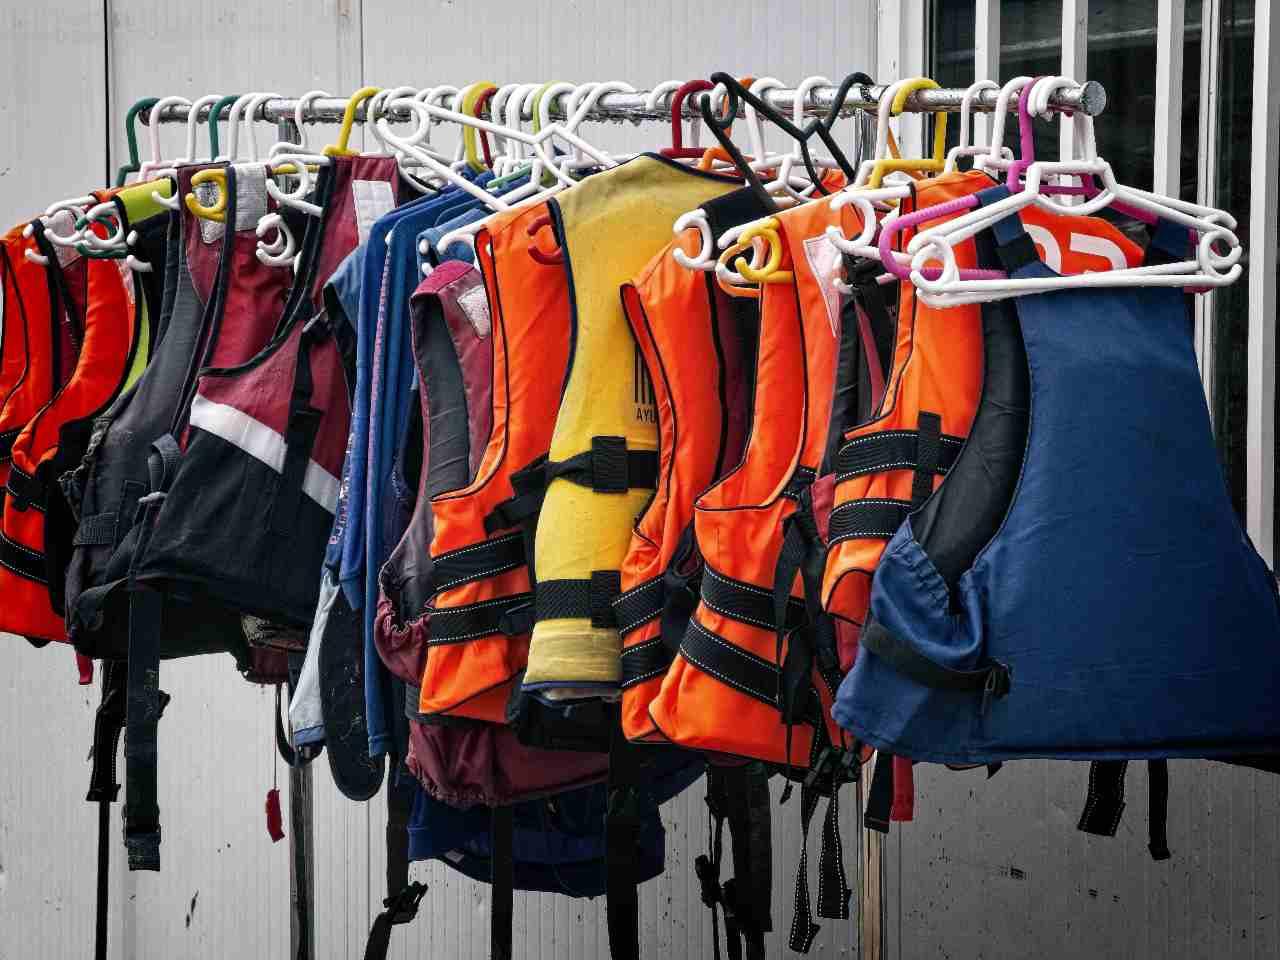 lifejackets on hangers